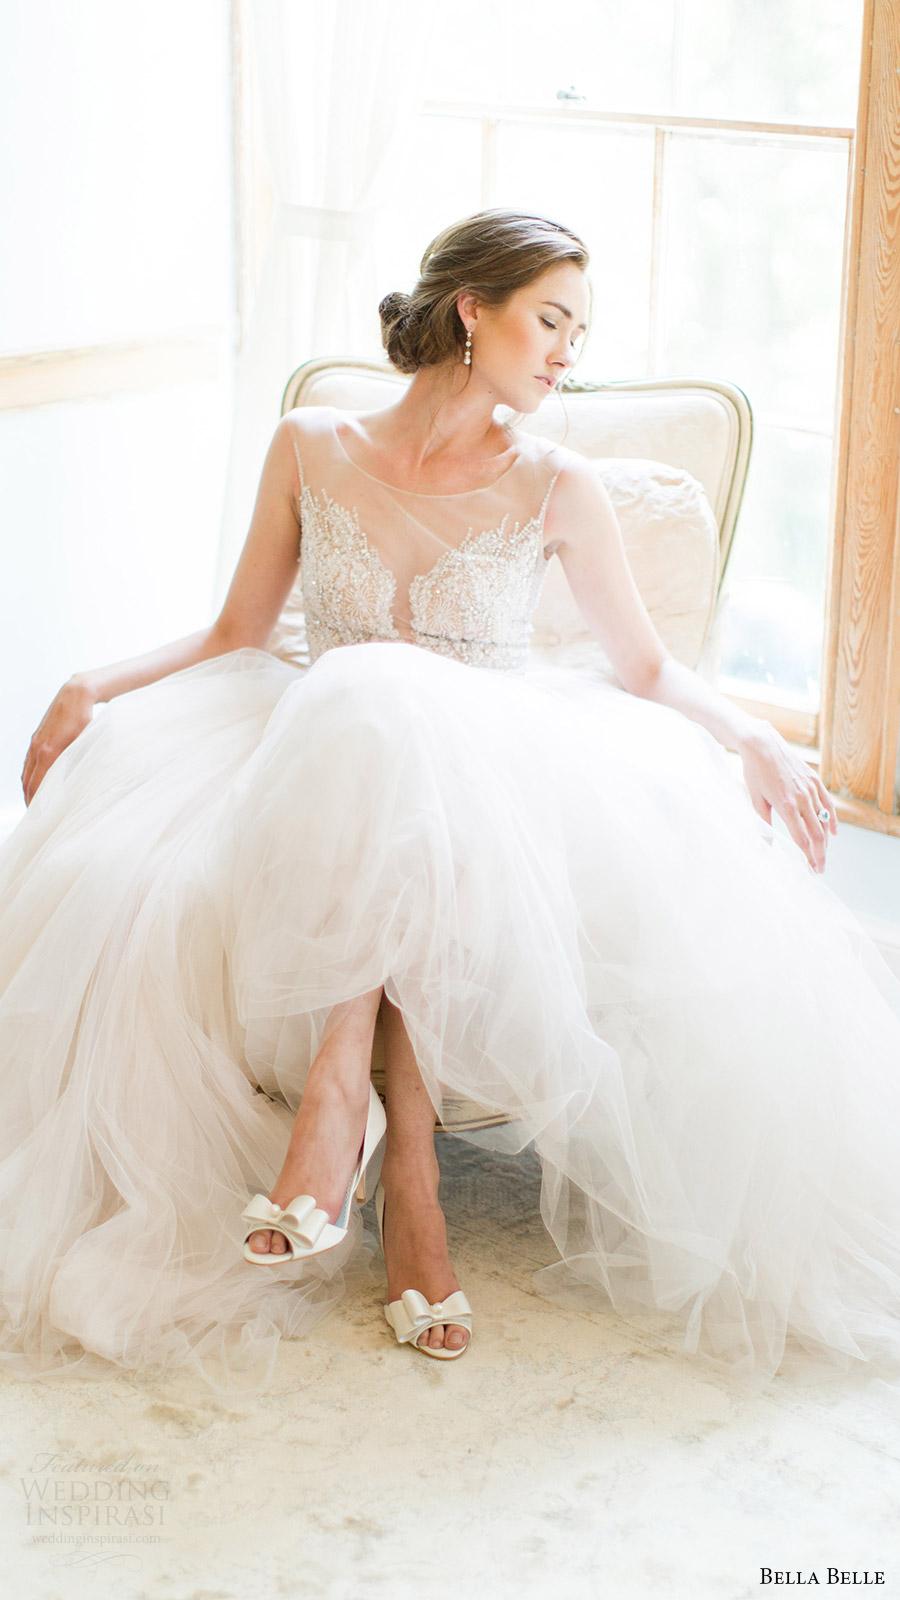 bella belle bridal shoes 2016 julia d orsay peep toe 3.5 inch heels wedding shoes watters wtoo gown